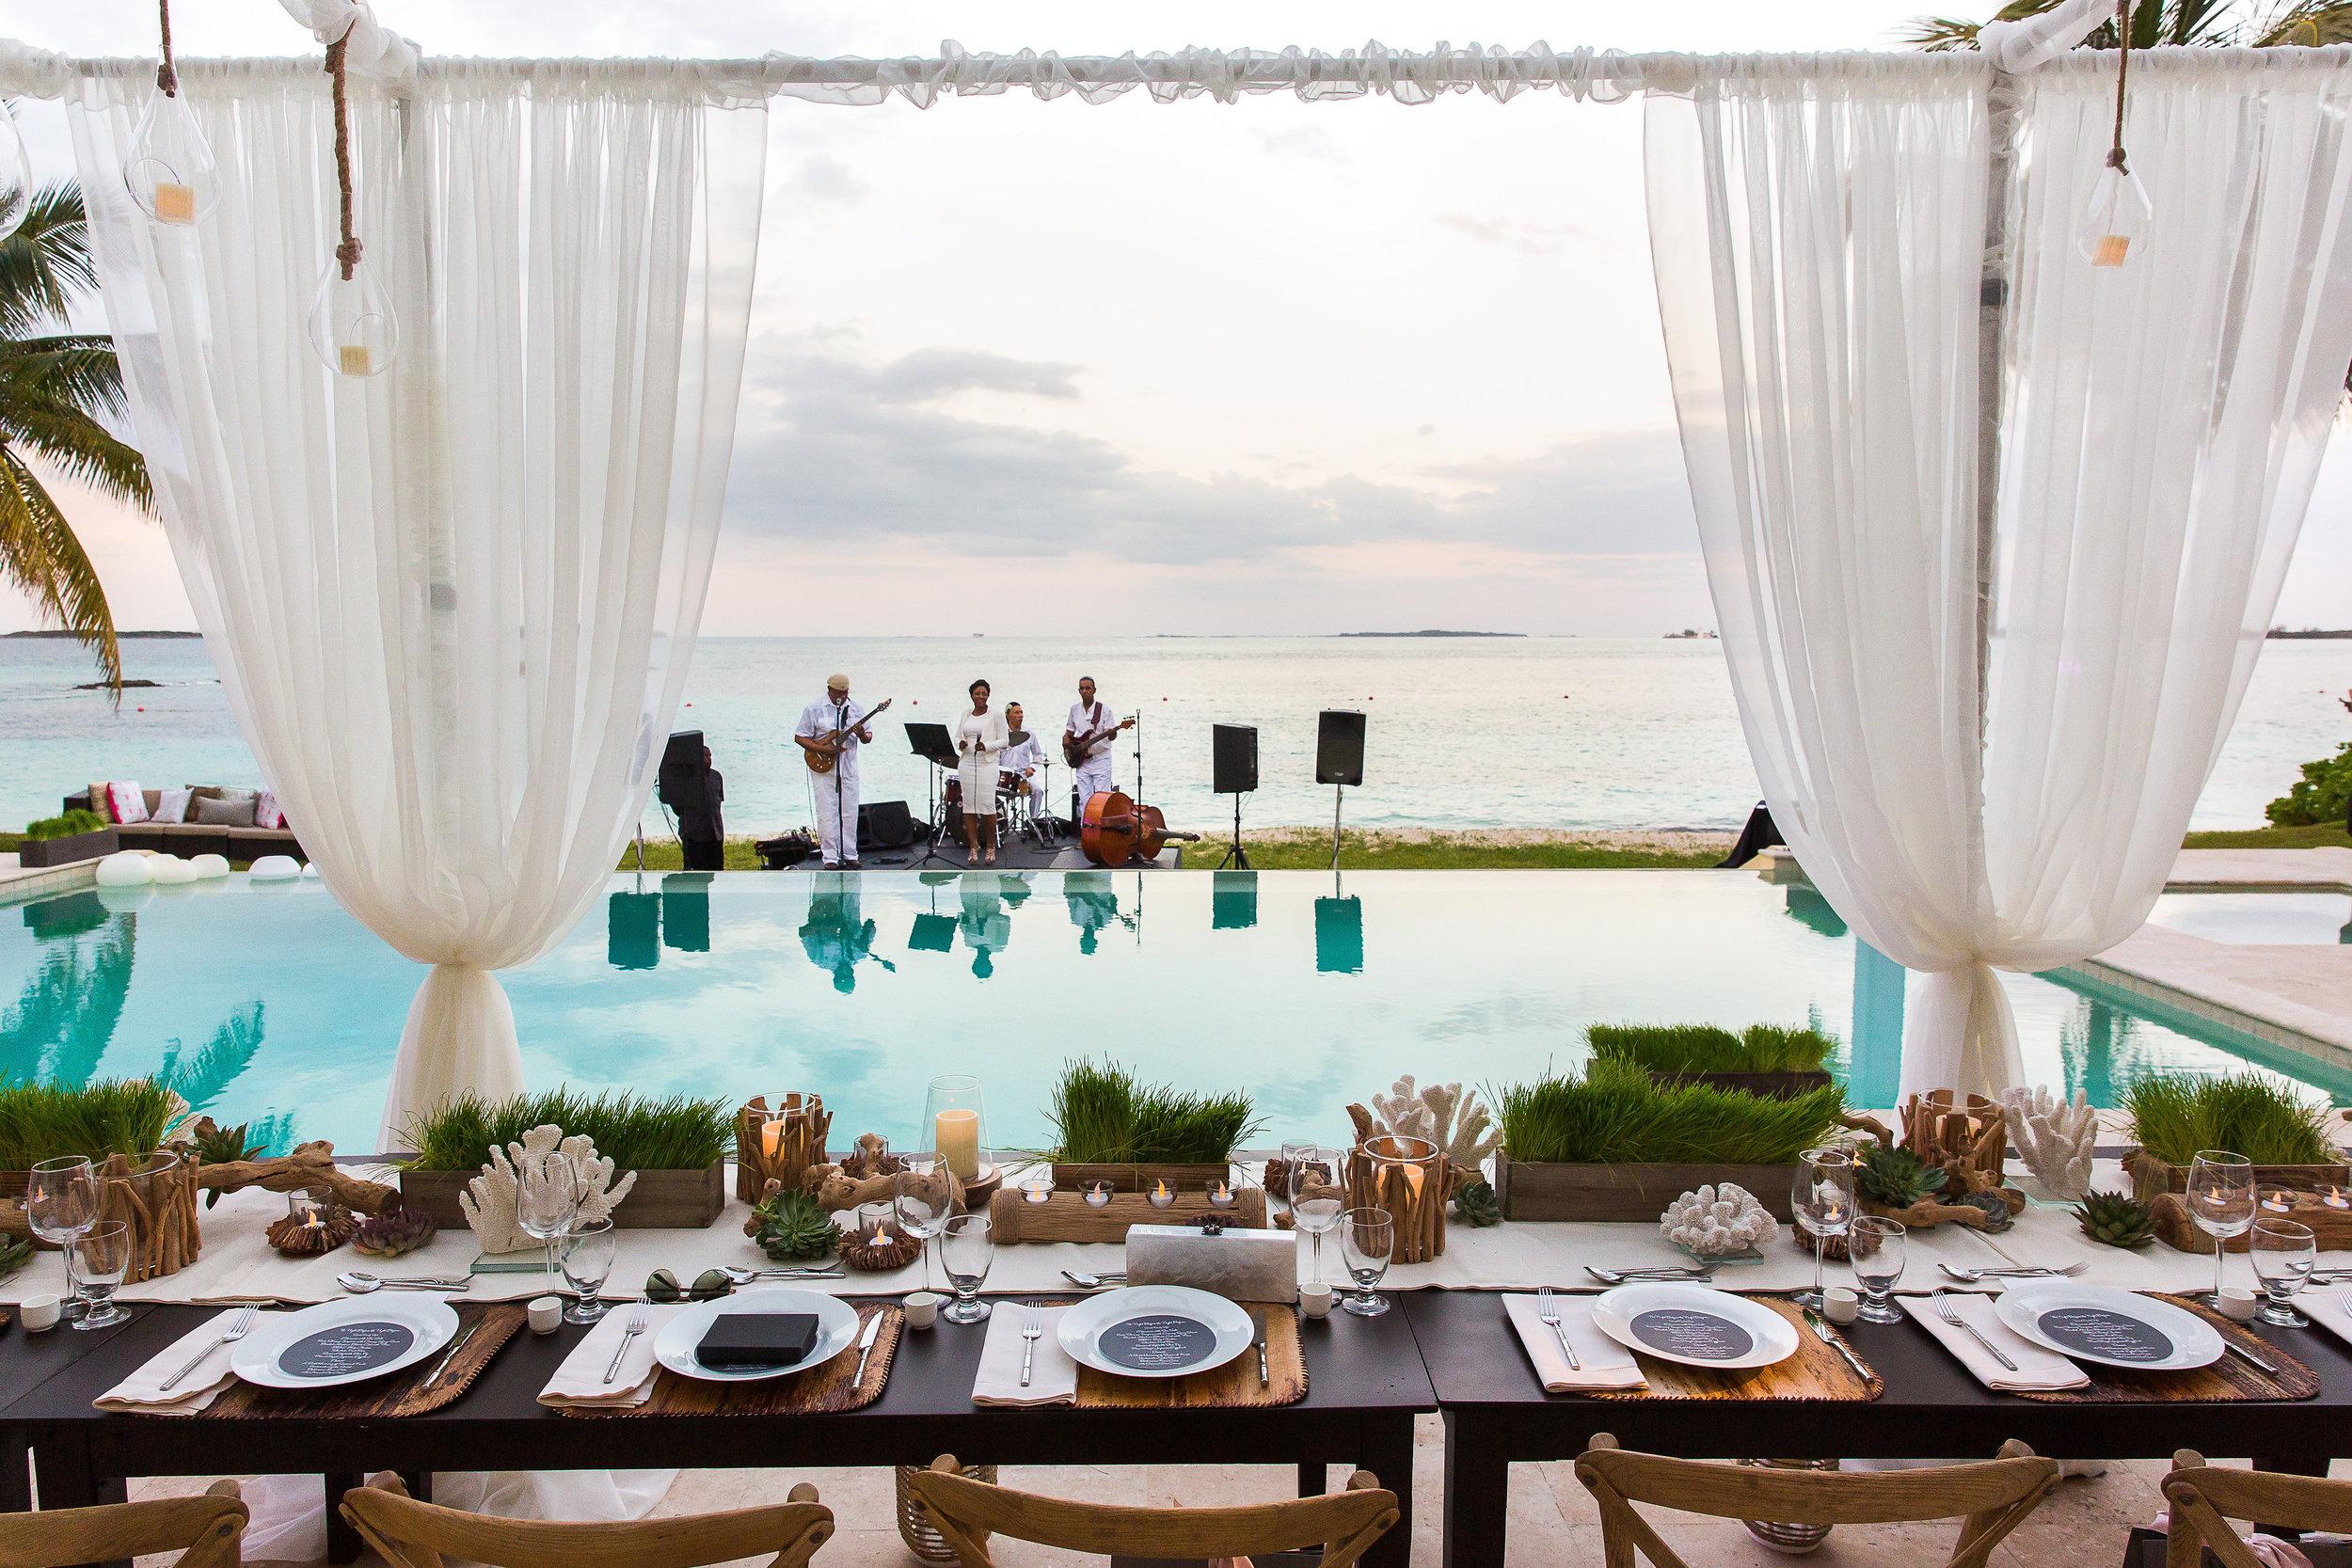 Ceci_New_York_Ceci_Style_Ceci_Johnson_Luxury_Lifestyle_Destination_Bahamas_Wedding_Letterpress_Inspiration_Design_Custom_Couture_Personalized_Invitations_9.jpg